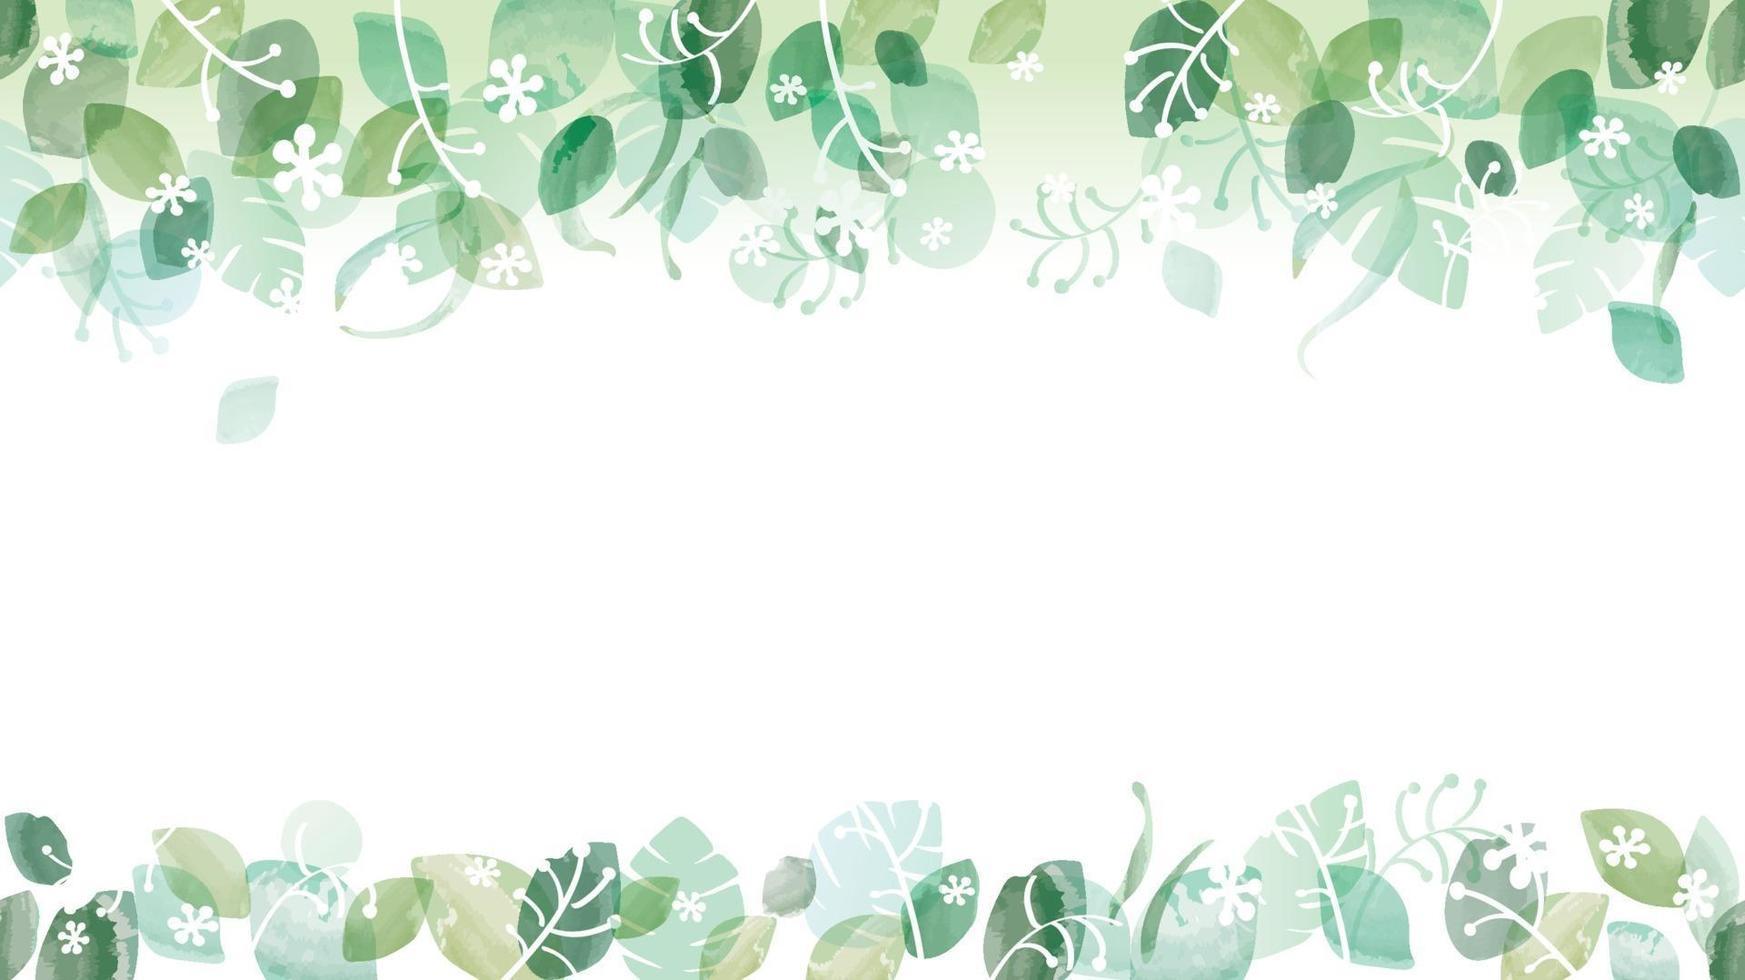 Fondo verde fresco acuarela transparente con espacio de texto, ilustración vectorial. vector